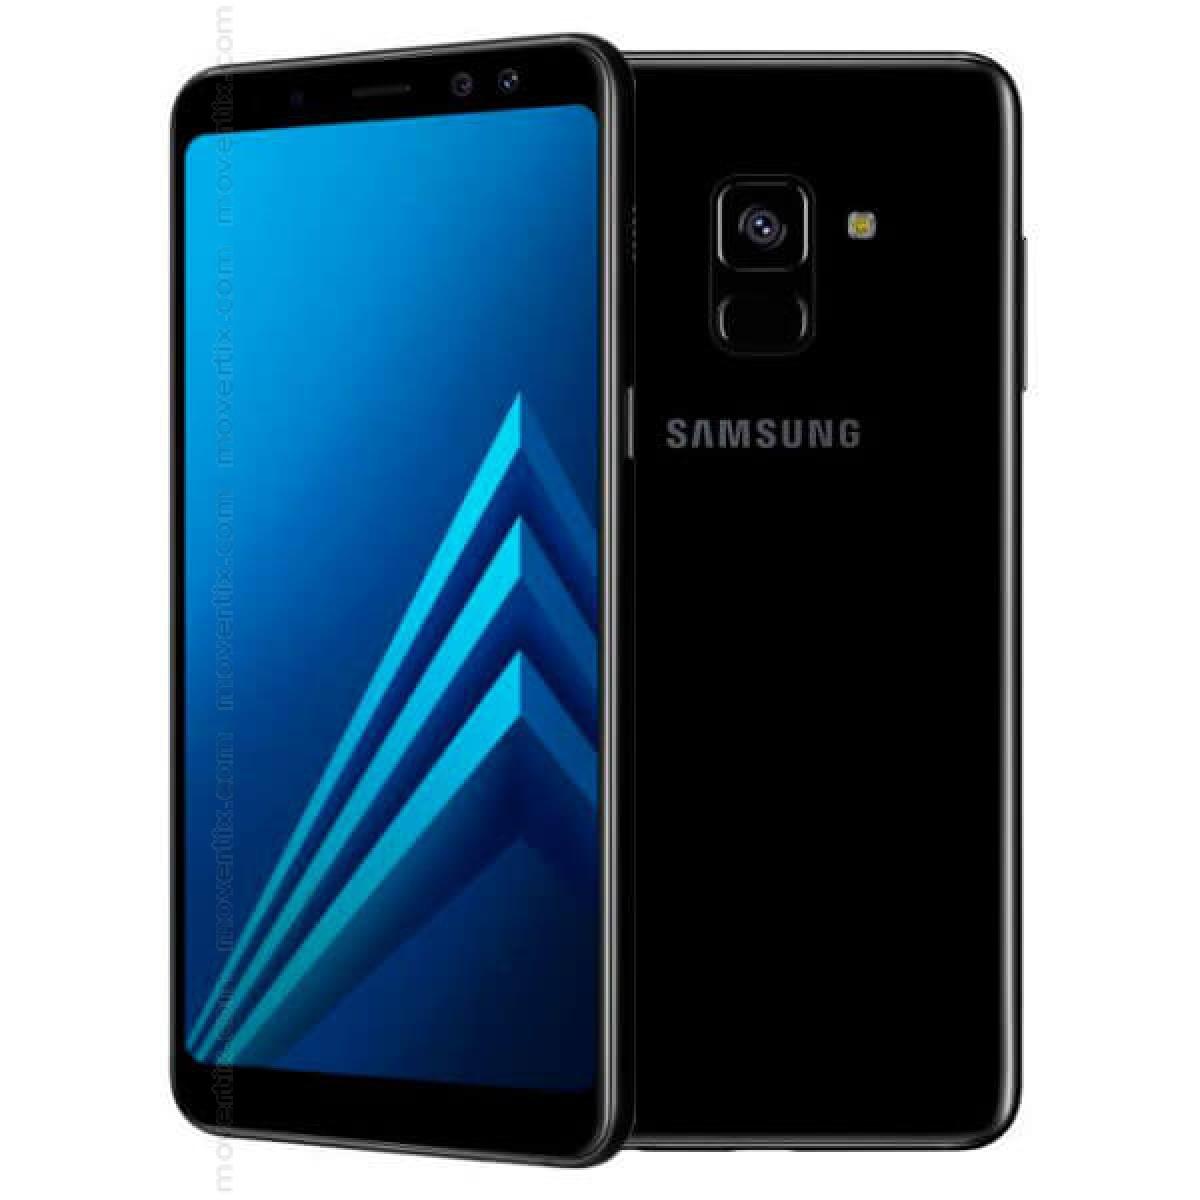 samsung galaxy a8 2018 dual sim black 32gb sm a530 8850007057376 movertix mobile phones shop. Black Bedroom Furniture Sets. Home Design Ideas